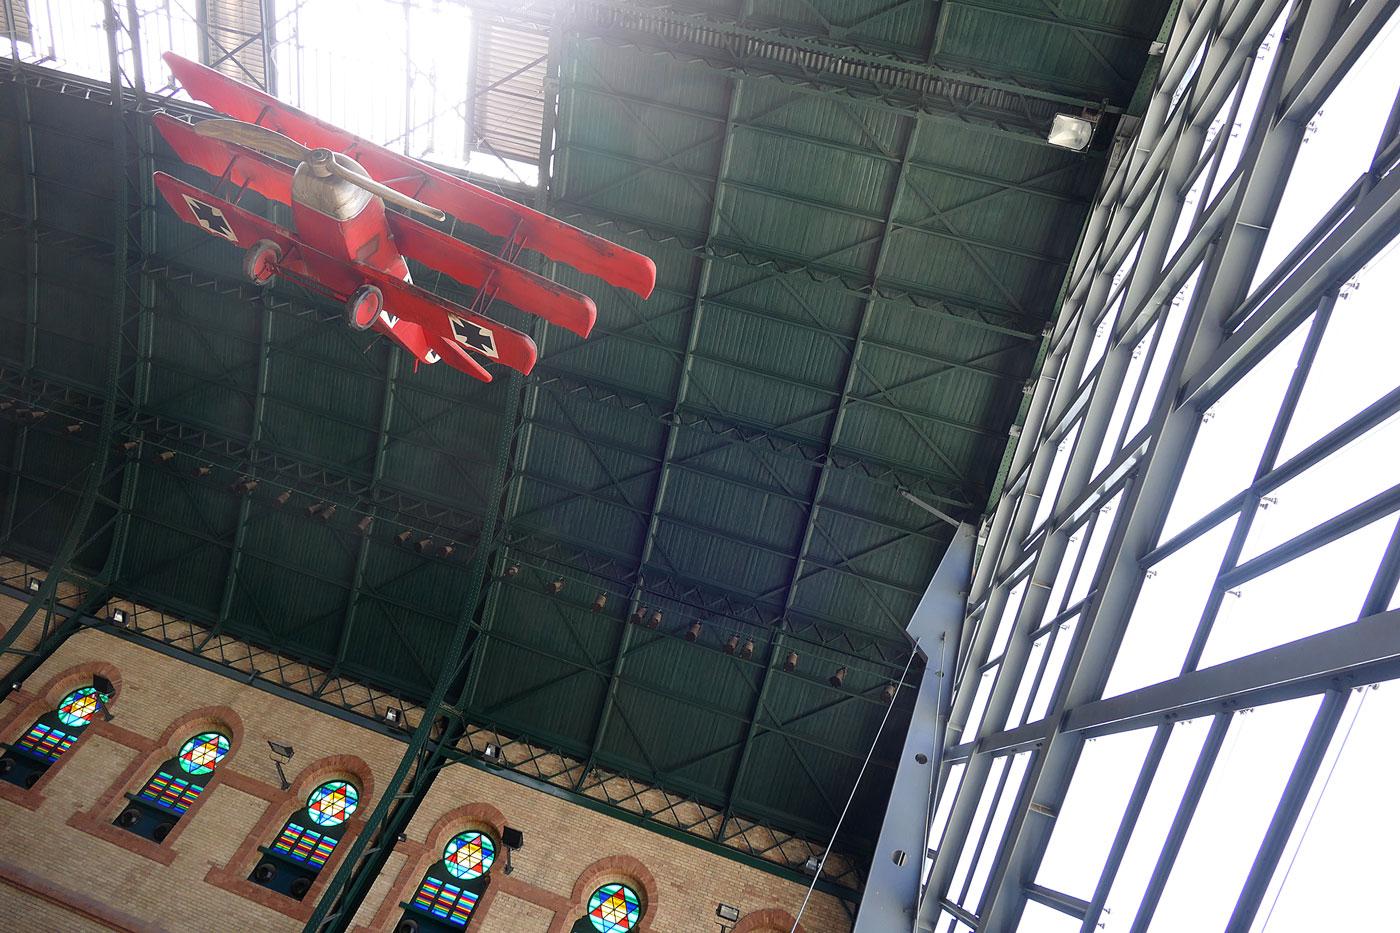 aeroplano cubierta antigua estacion cordoba sevilla cristalera